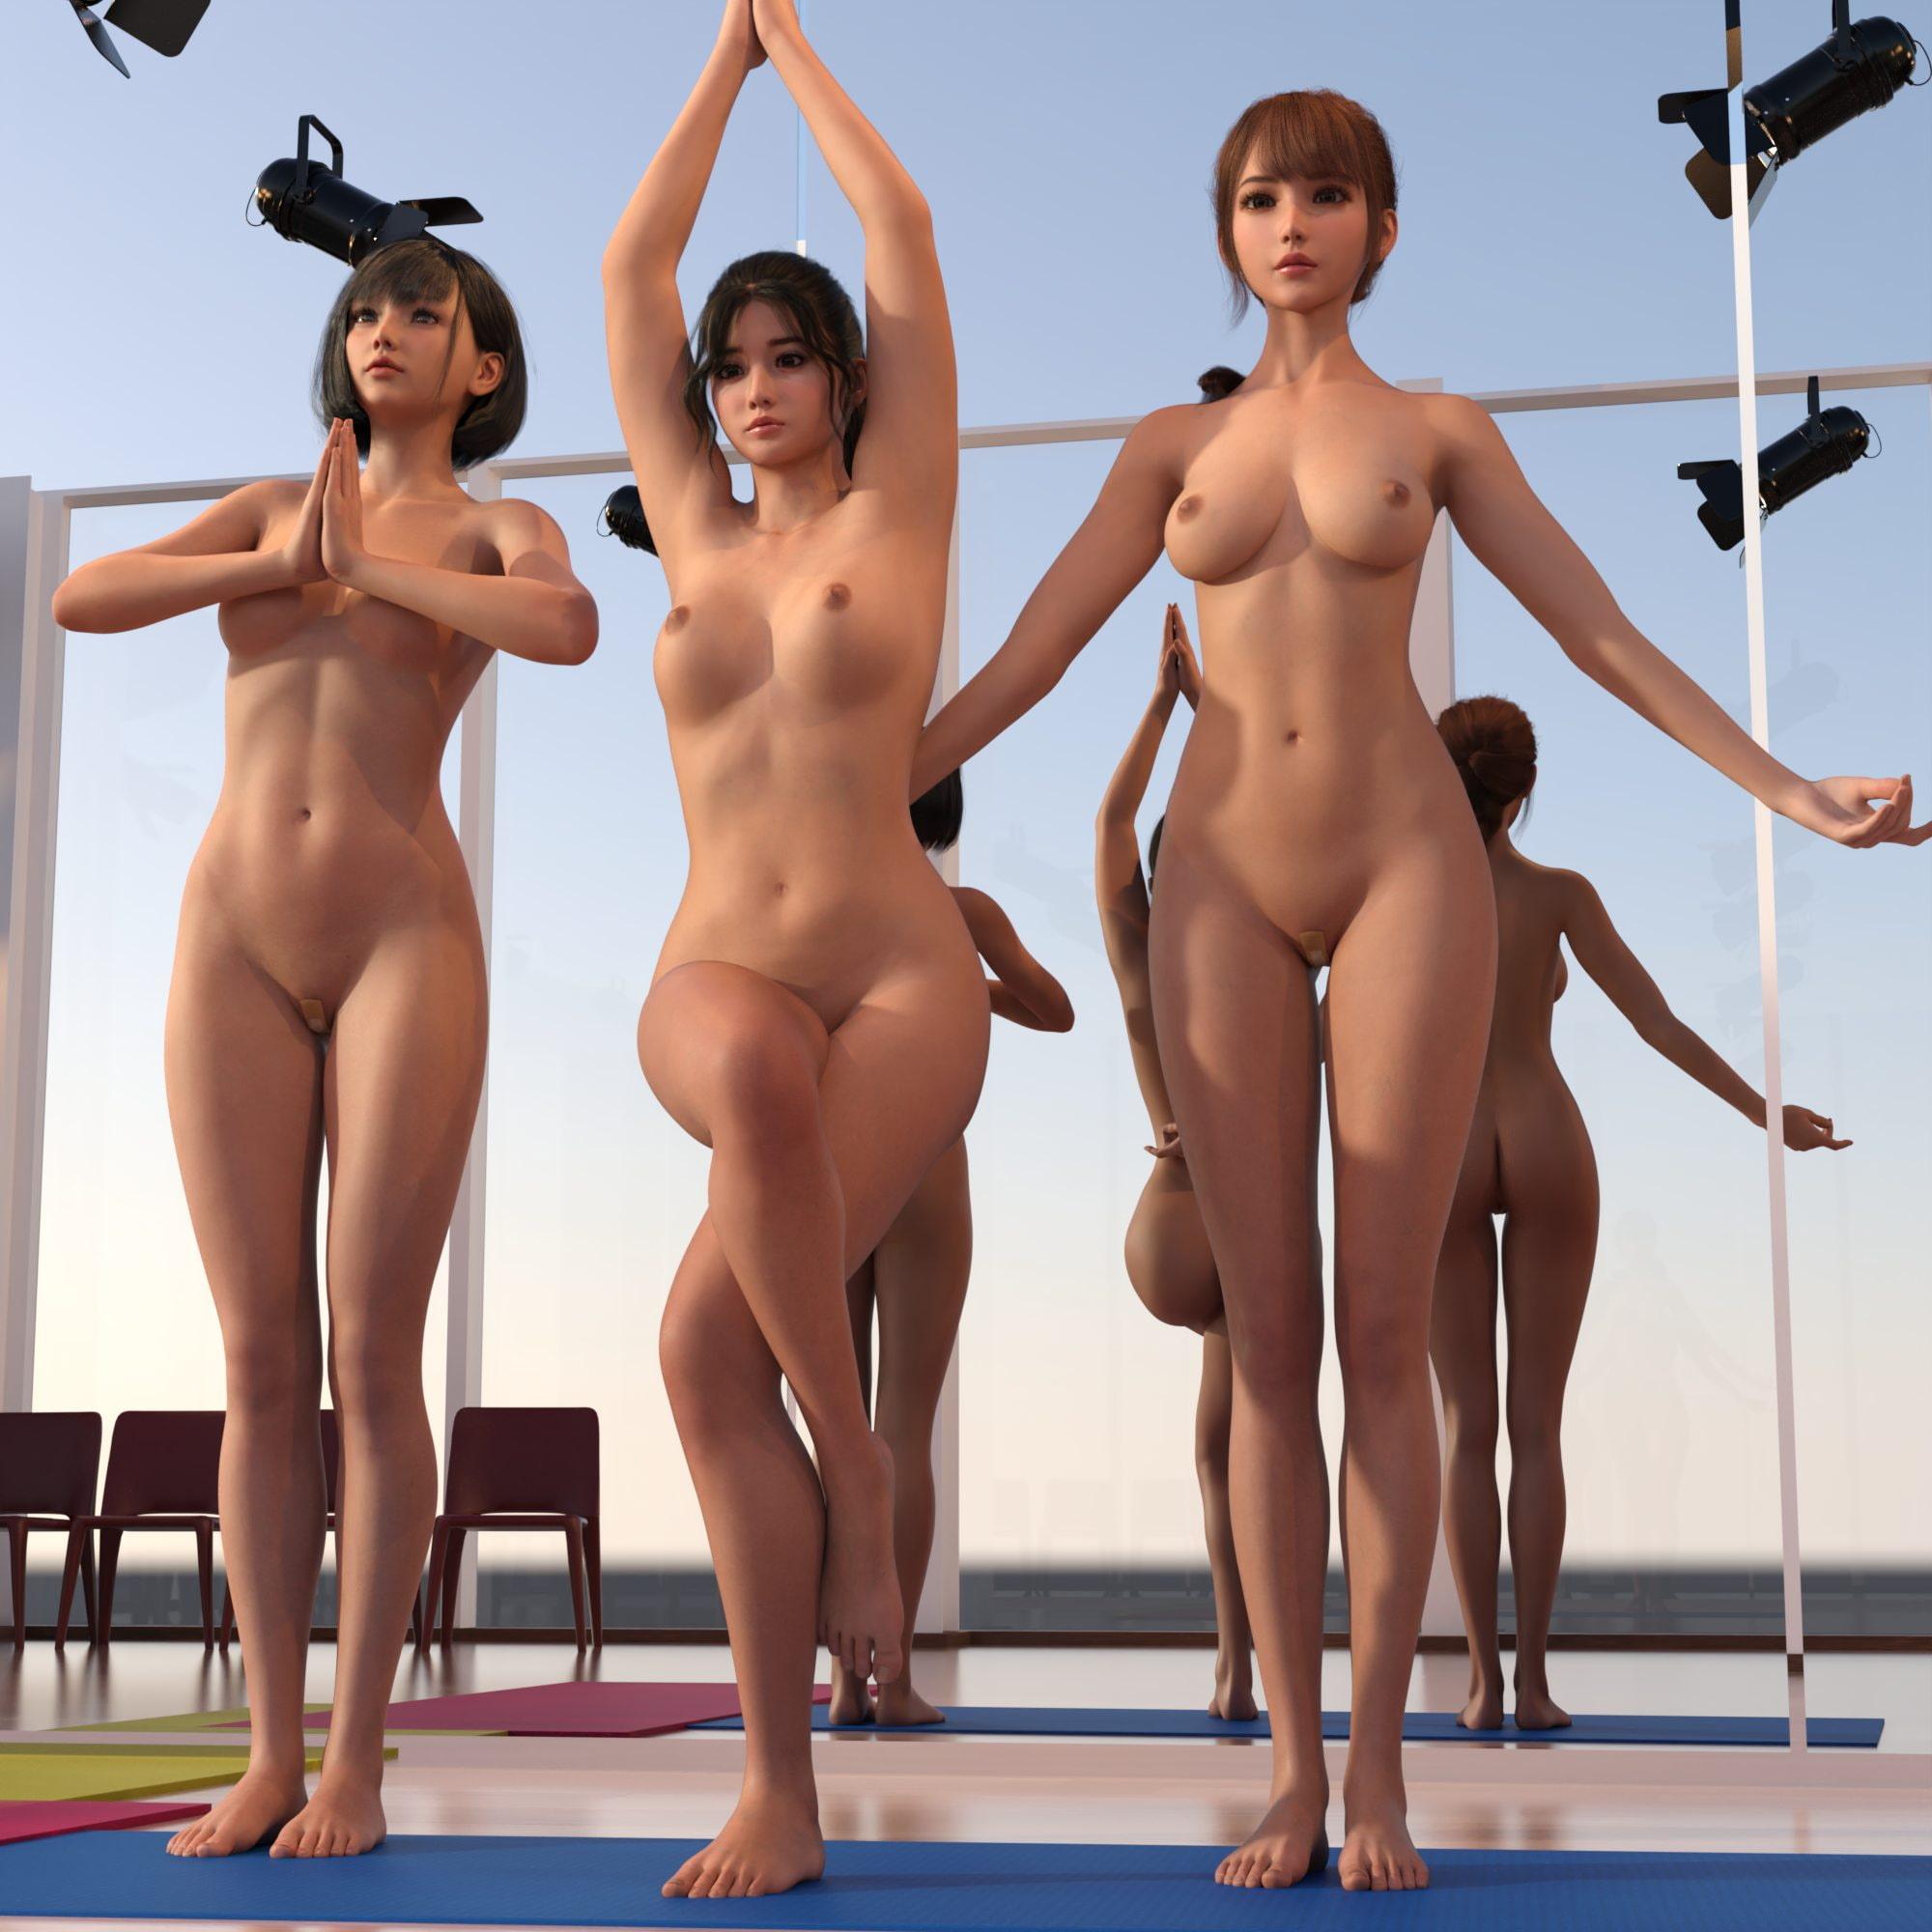 夏の全裸女体画像集 2021